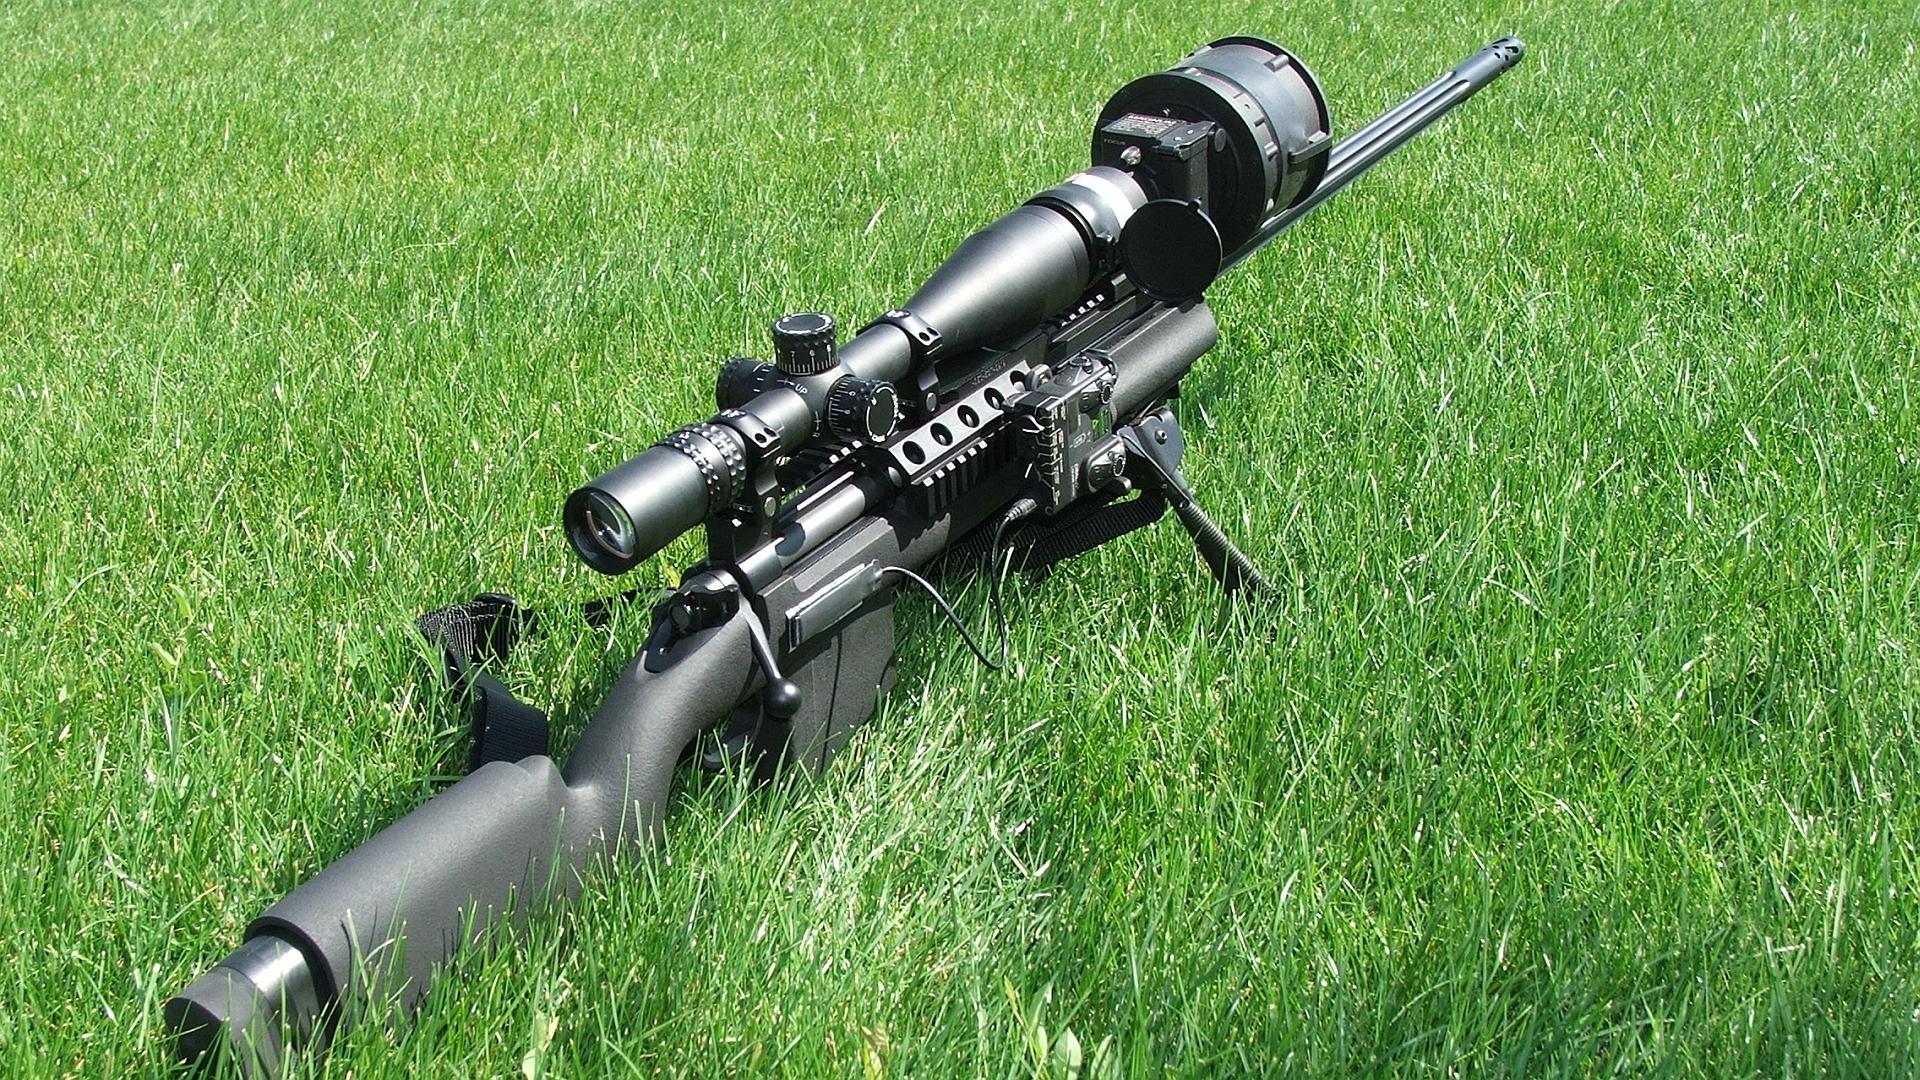 Sniper Rifle Wallpaper Hd wallpaper   621781 1920x1080